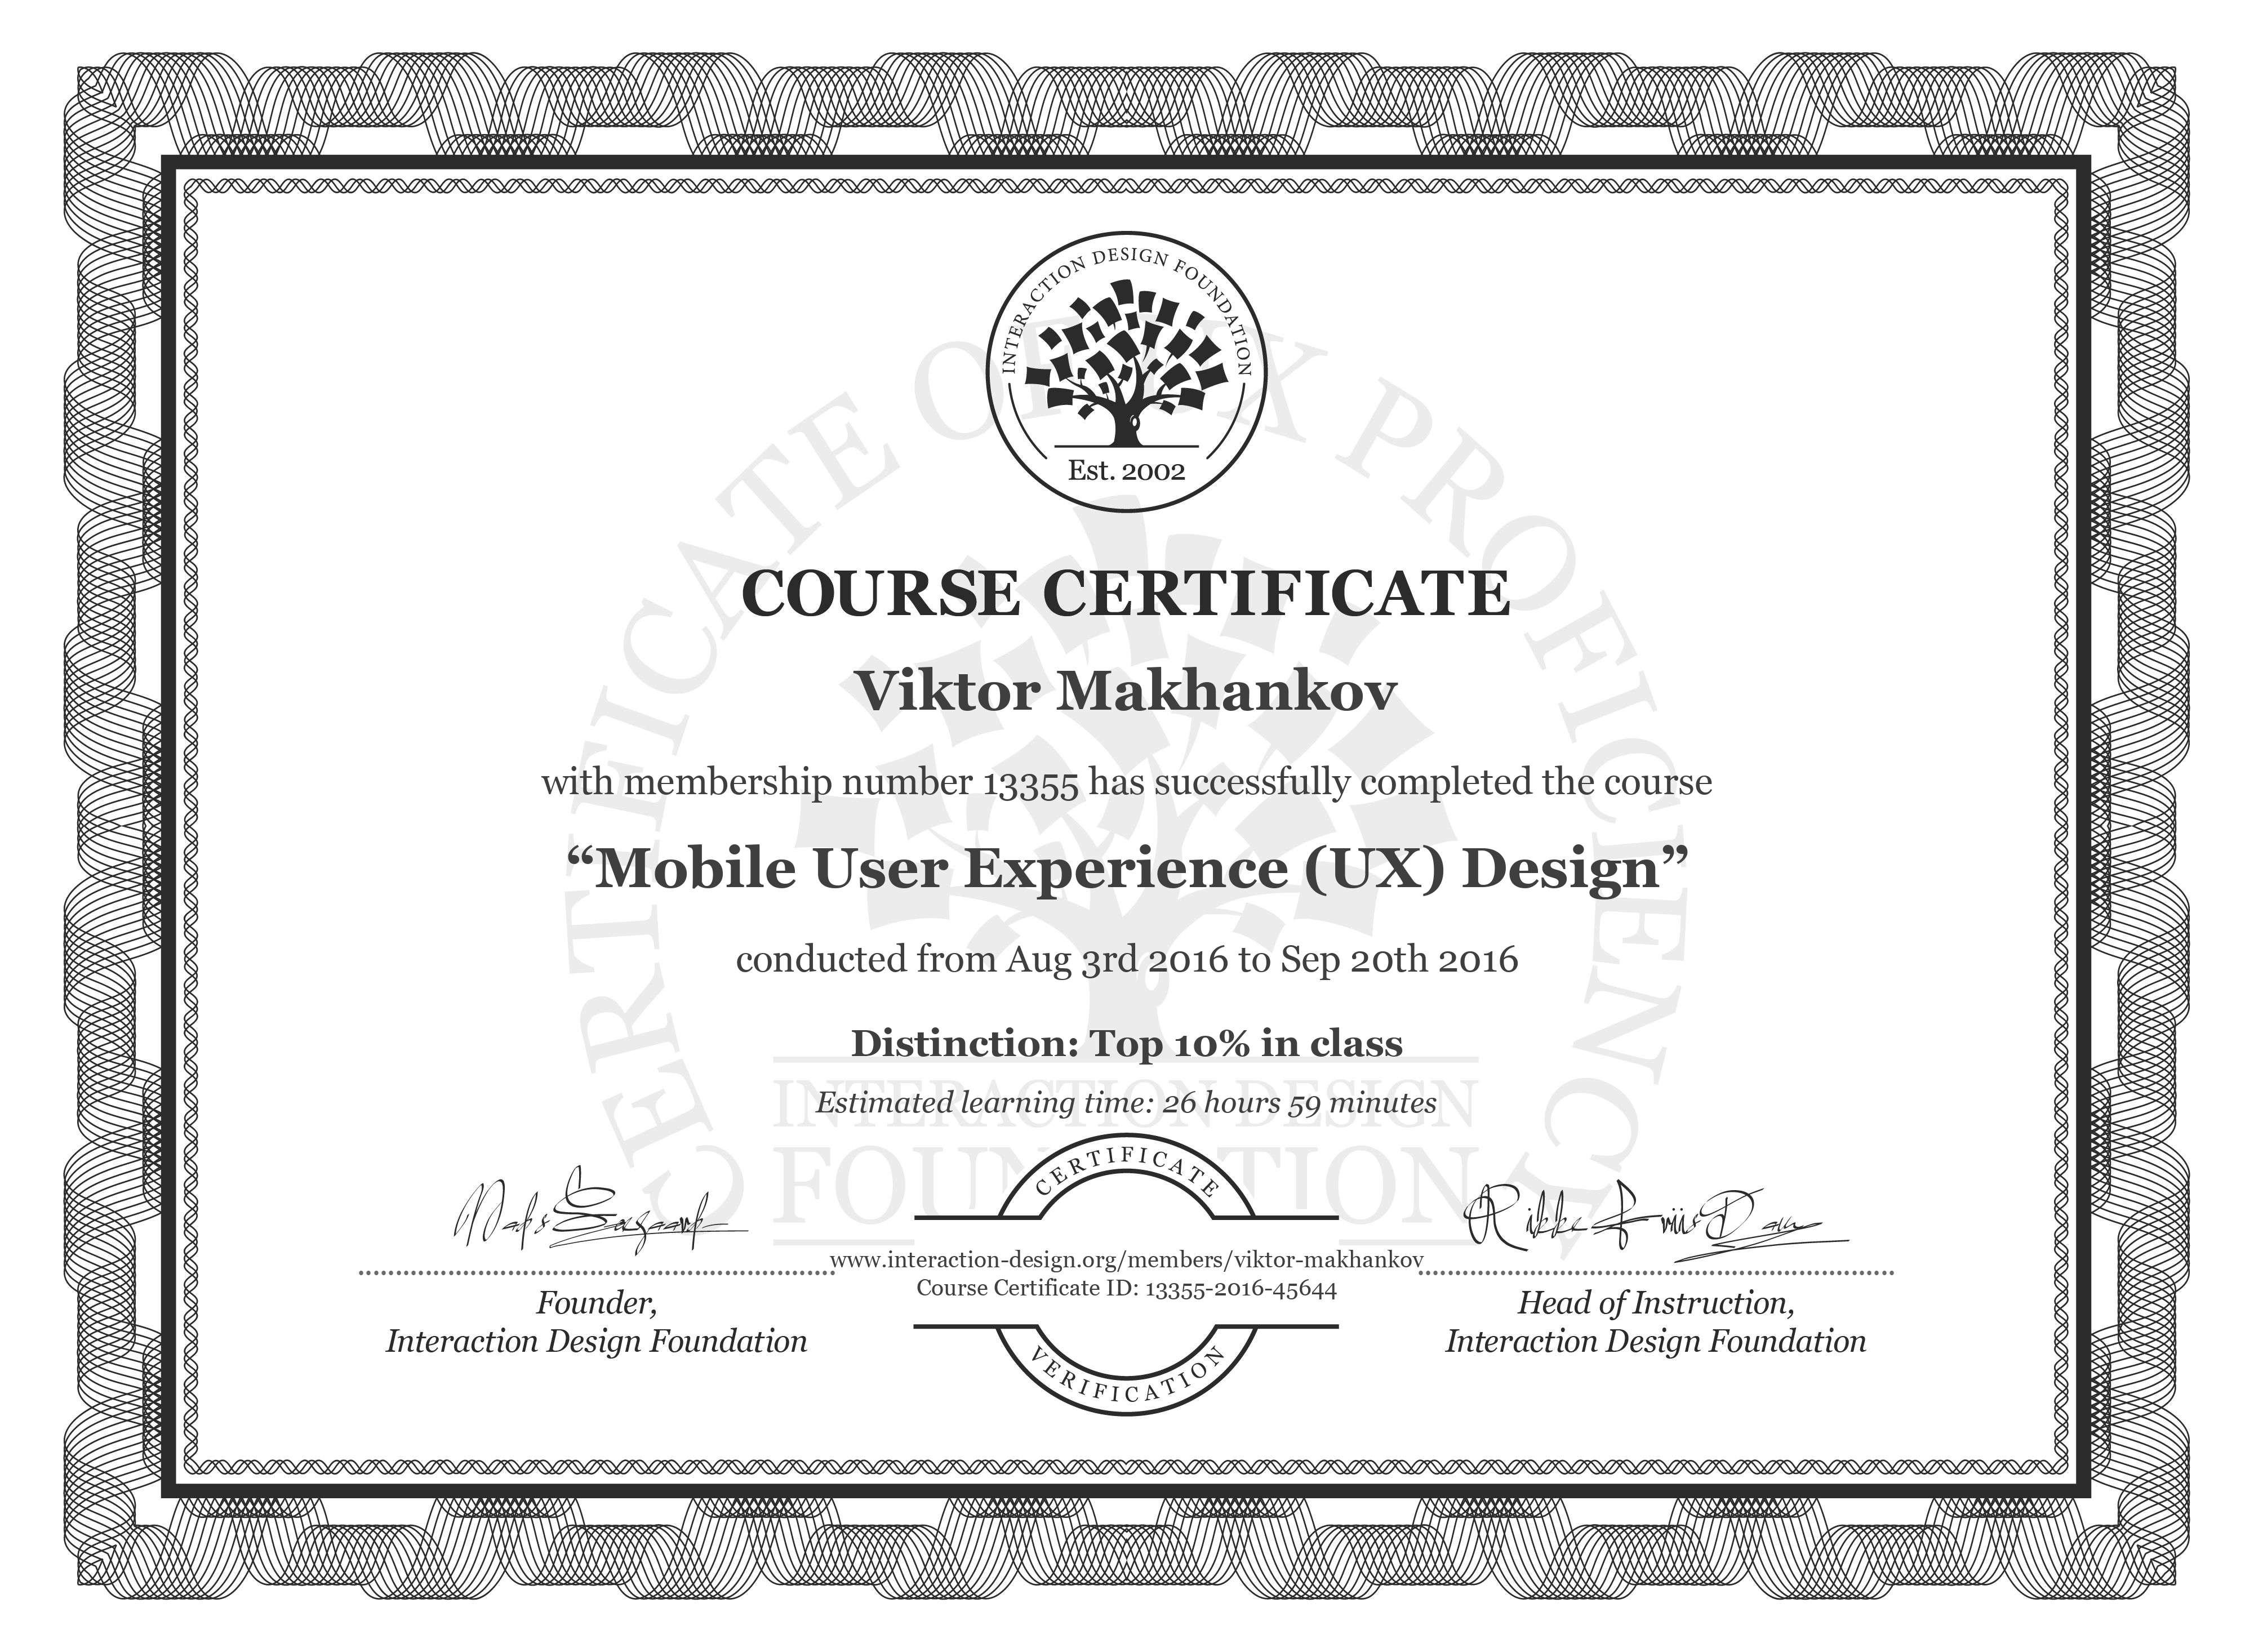 Viktor Makhankov: Course Certificate - Mobile User Experience (UX) Design